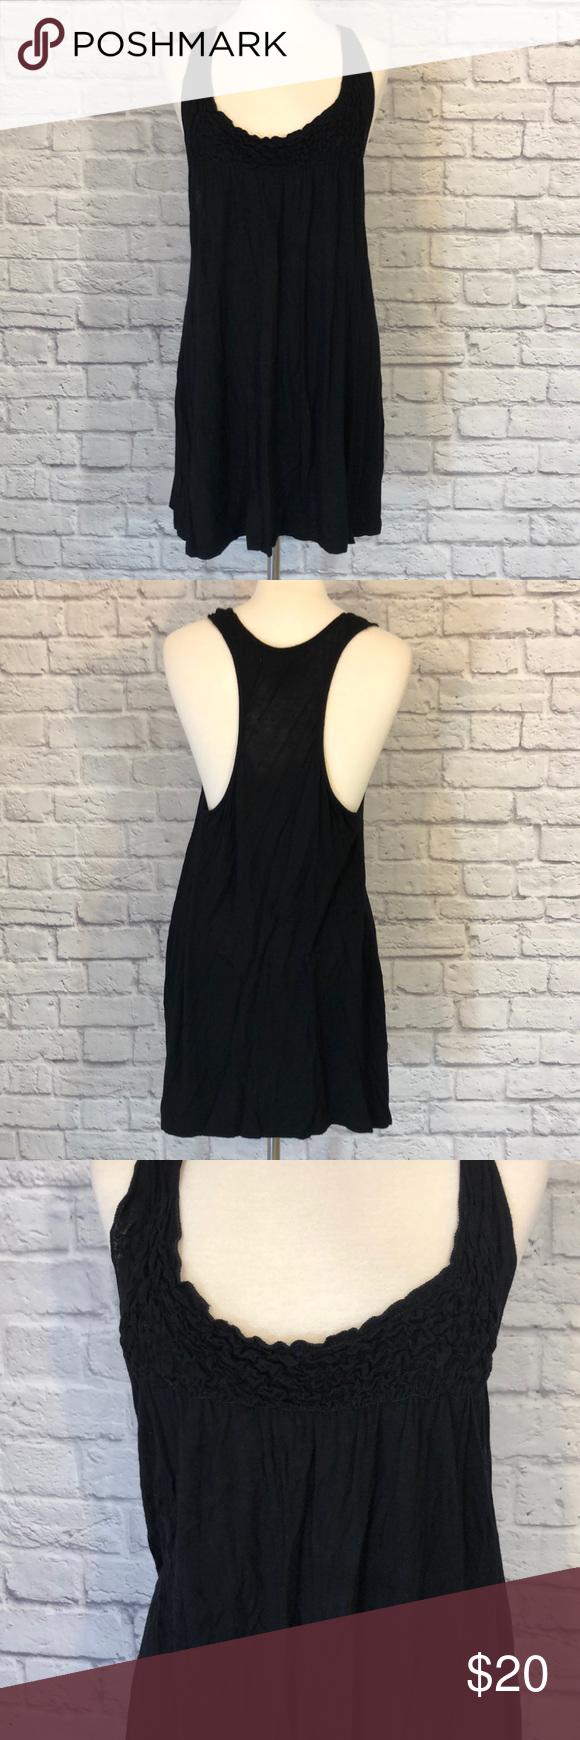 Love Notes Casual Little Black Racerback Dress Racerback Dress Clothes Design Tank Top Fashion [ 1740 x 580 Pixel ]